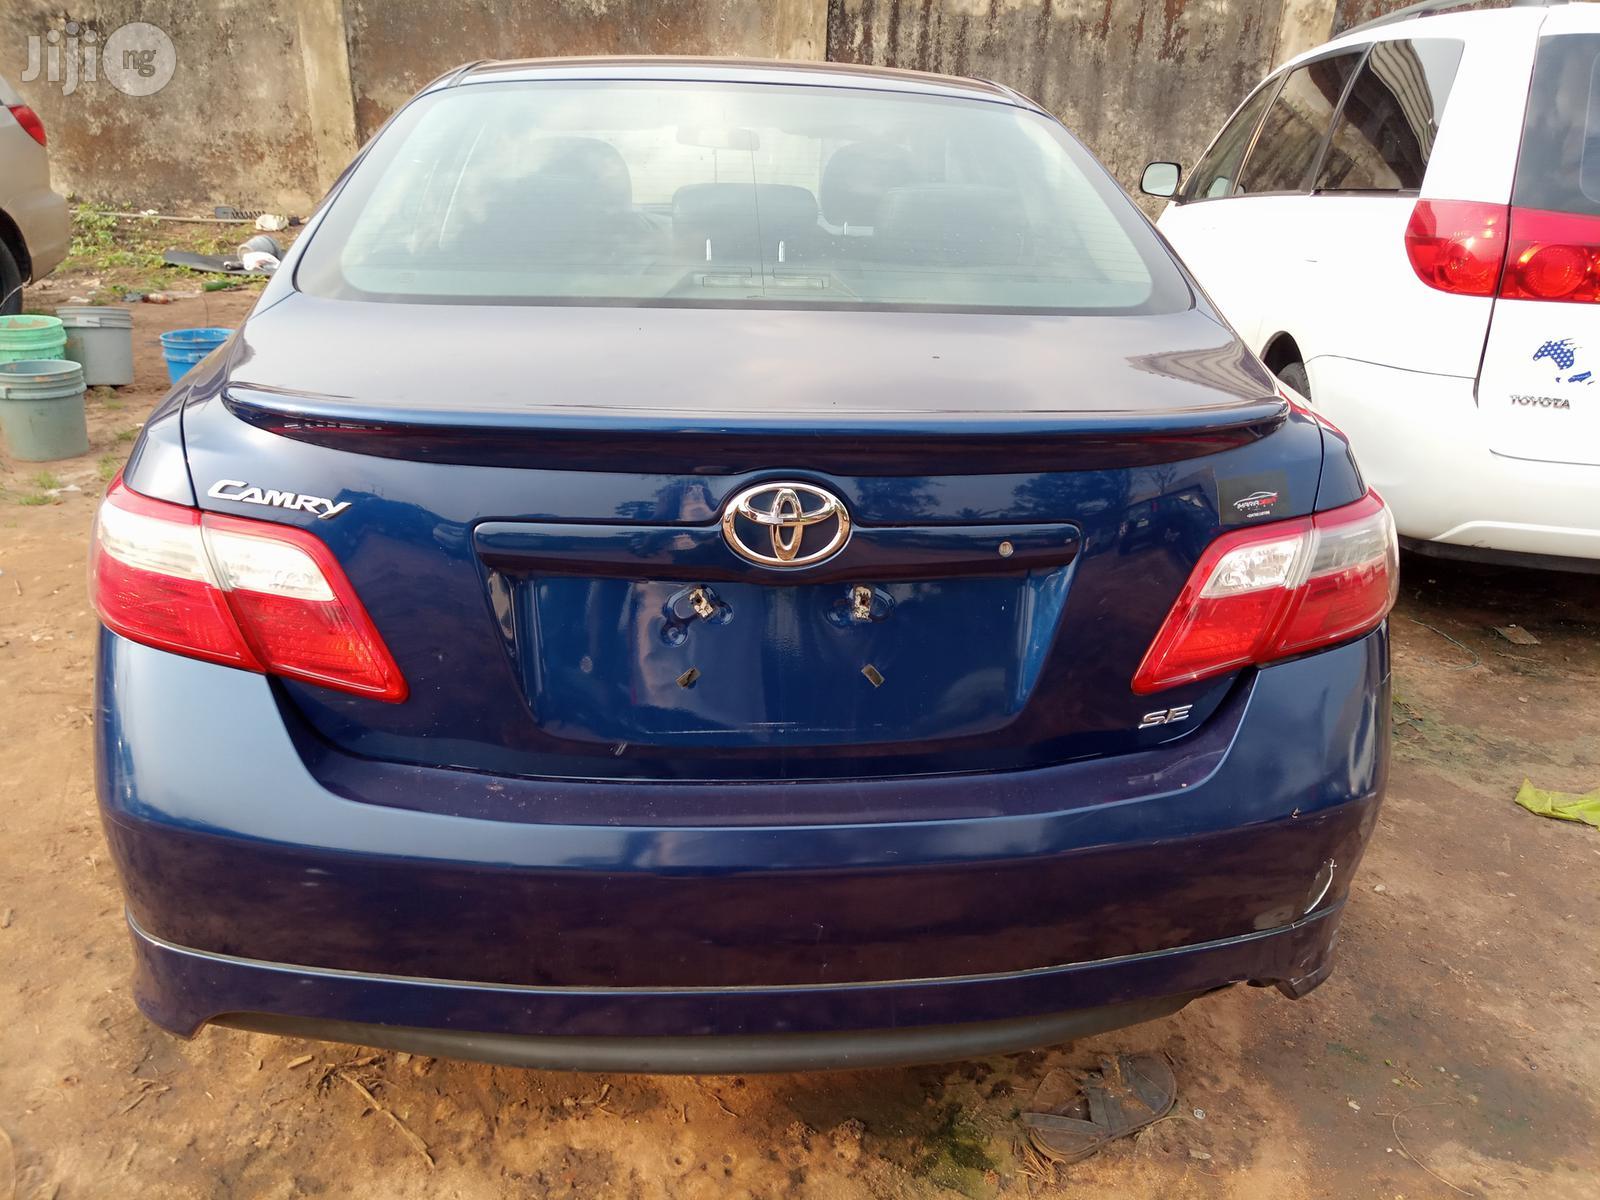 Toyota Camry 2009 Blue | Cars for sale in Ikpoba-Okha, Edo State, Nigeria